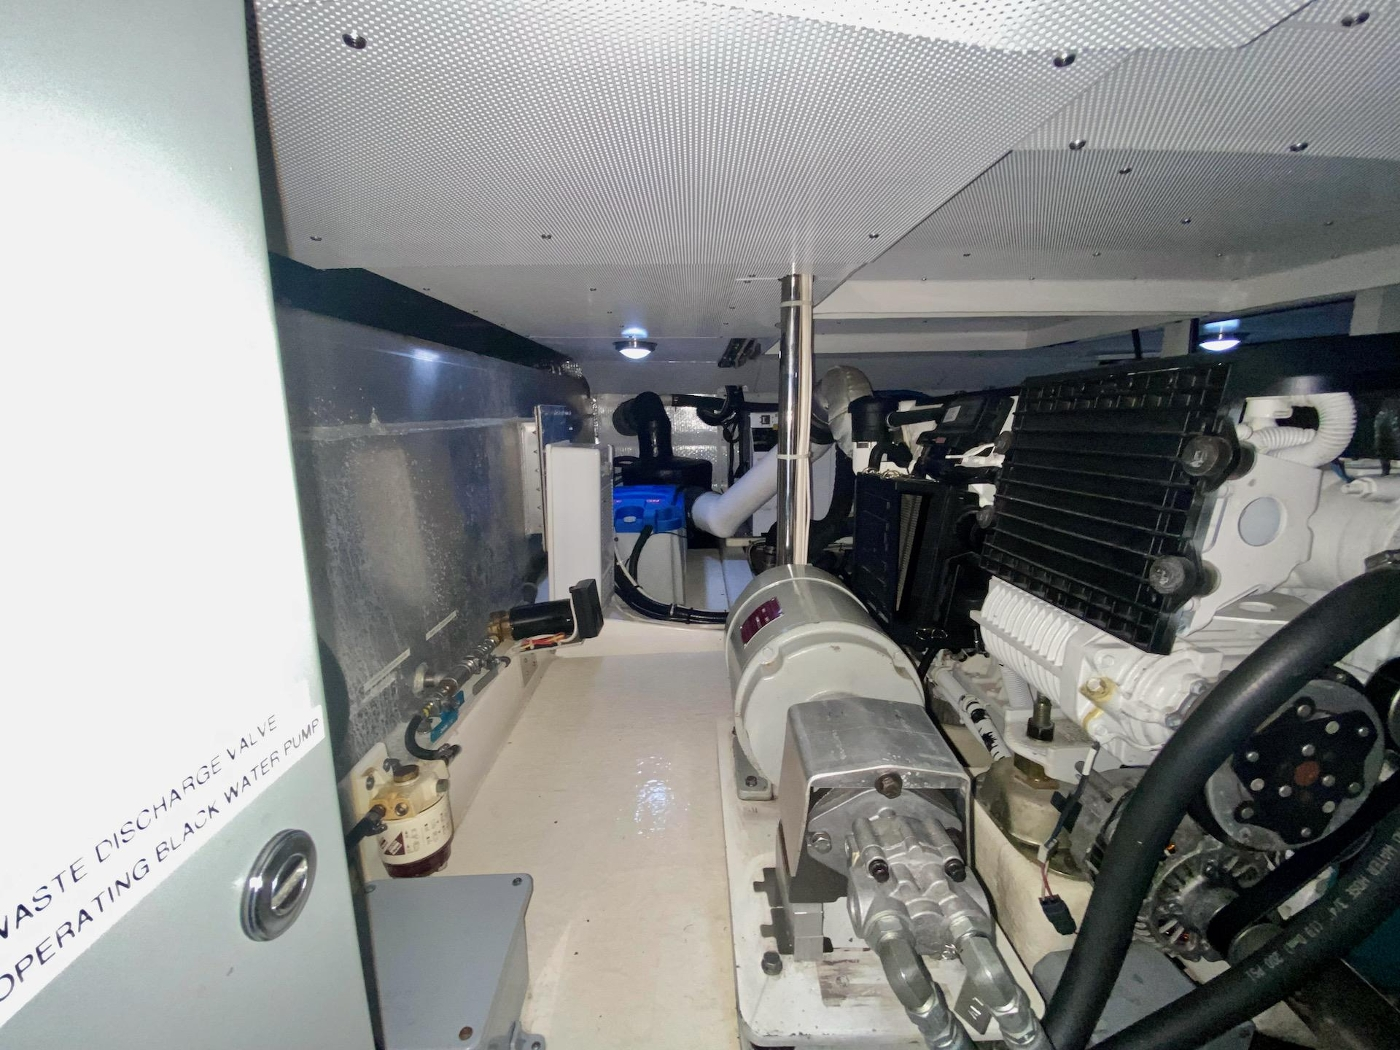 2010 Bracewell 41, Machinery Space Detail 2